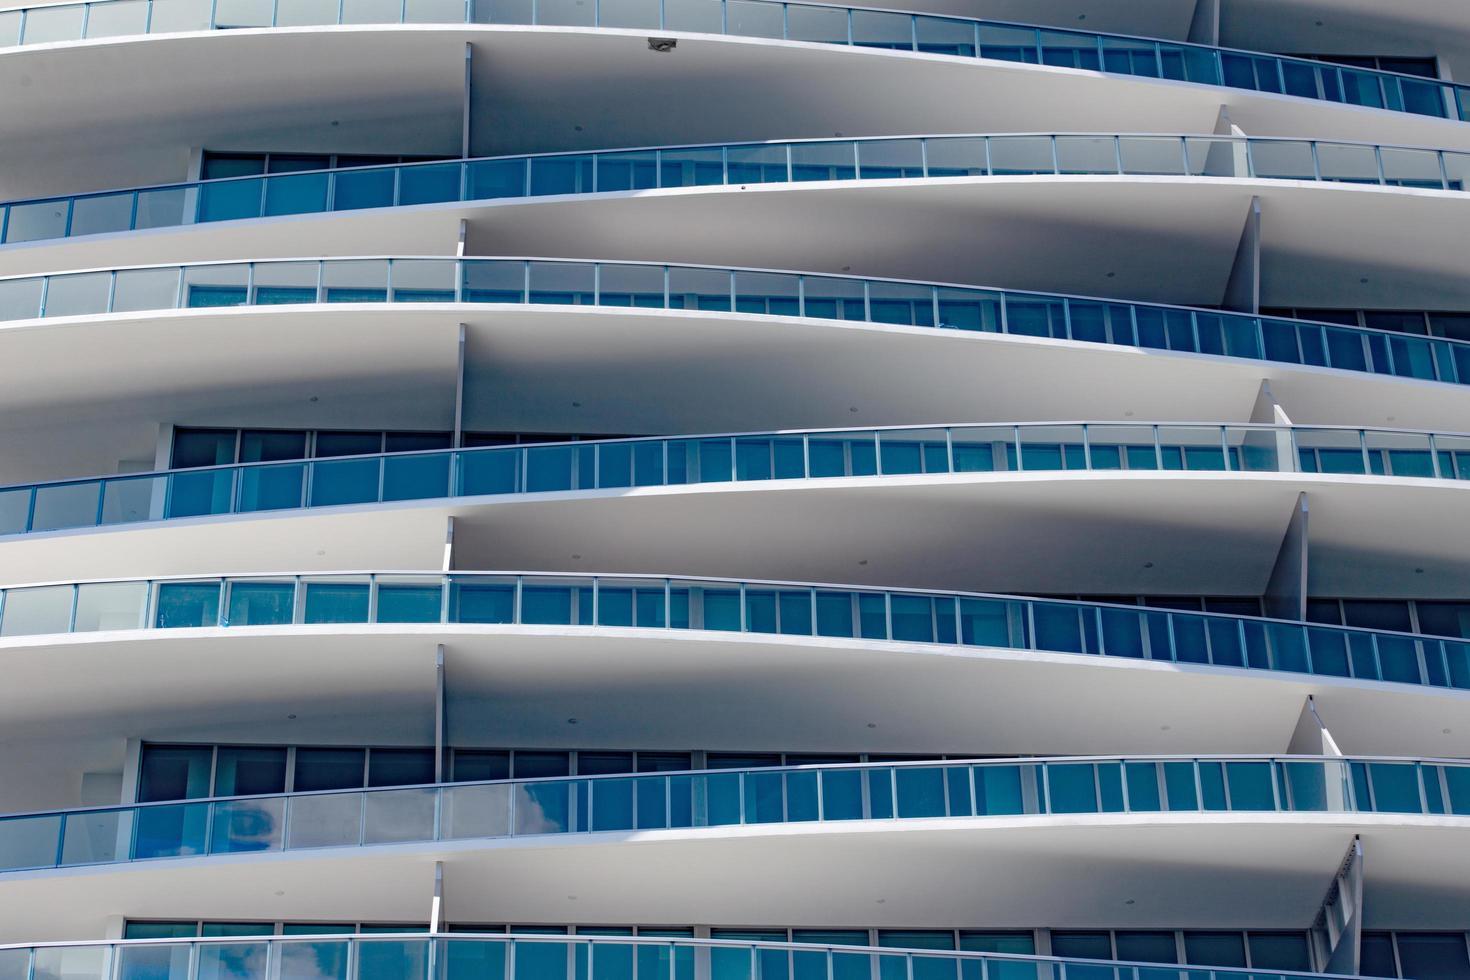 Miami, Floride, 2020 - bâtiment blanc moderne photo